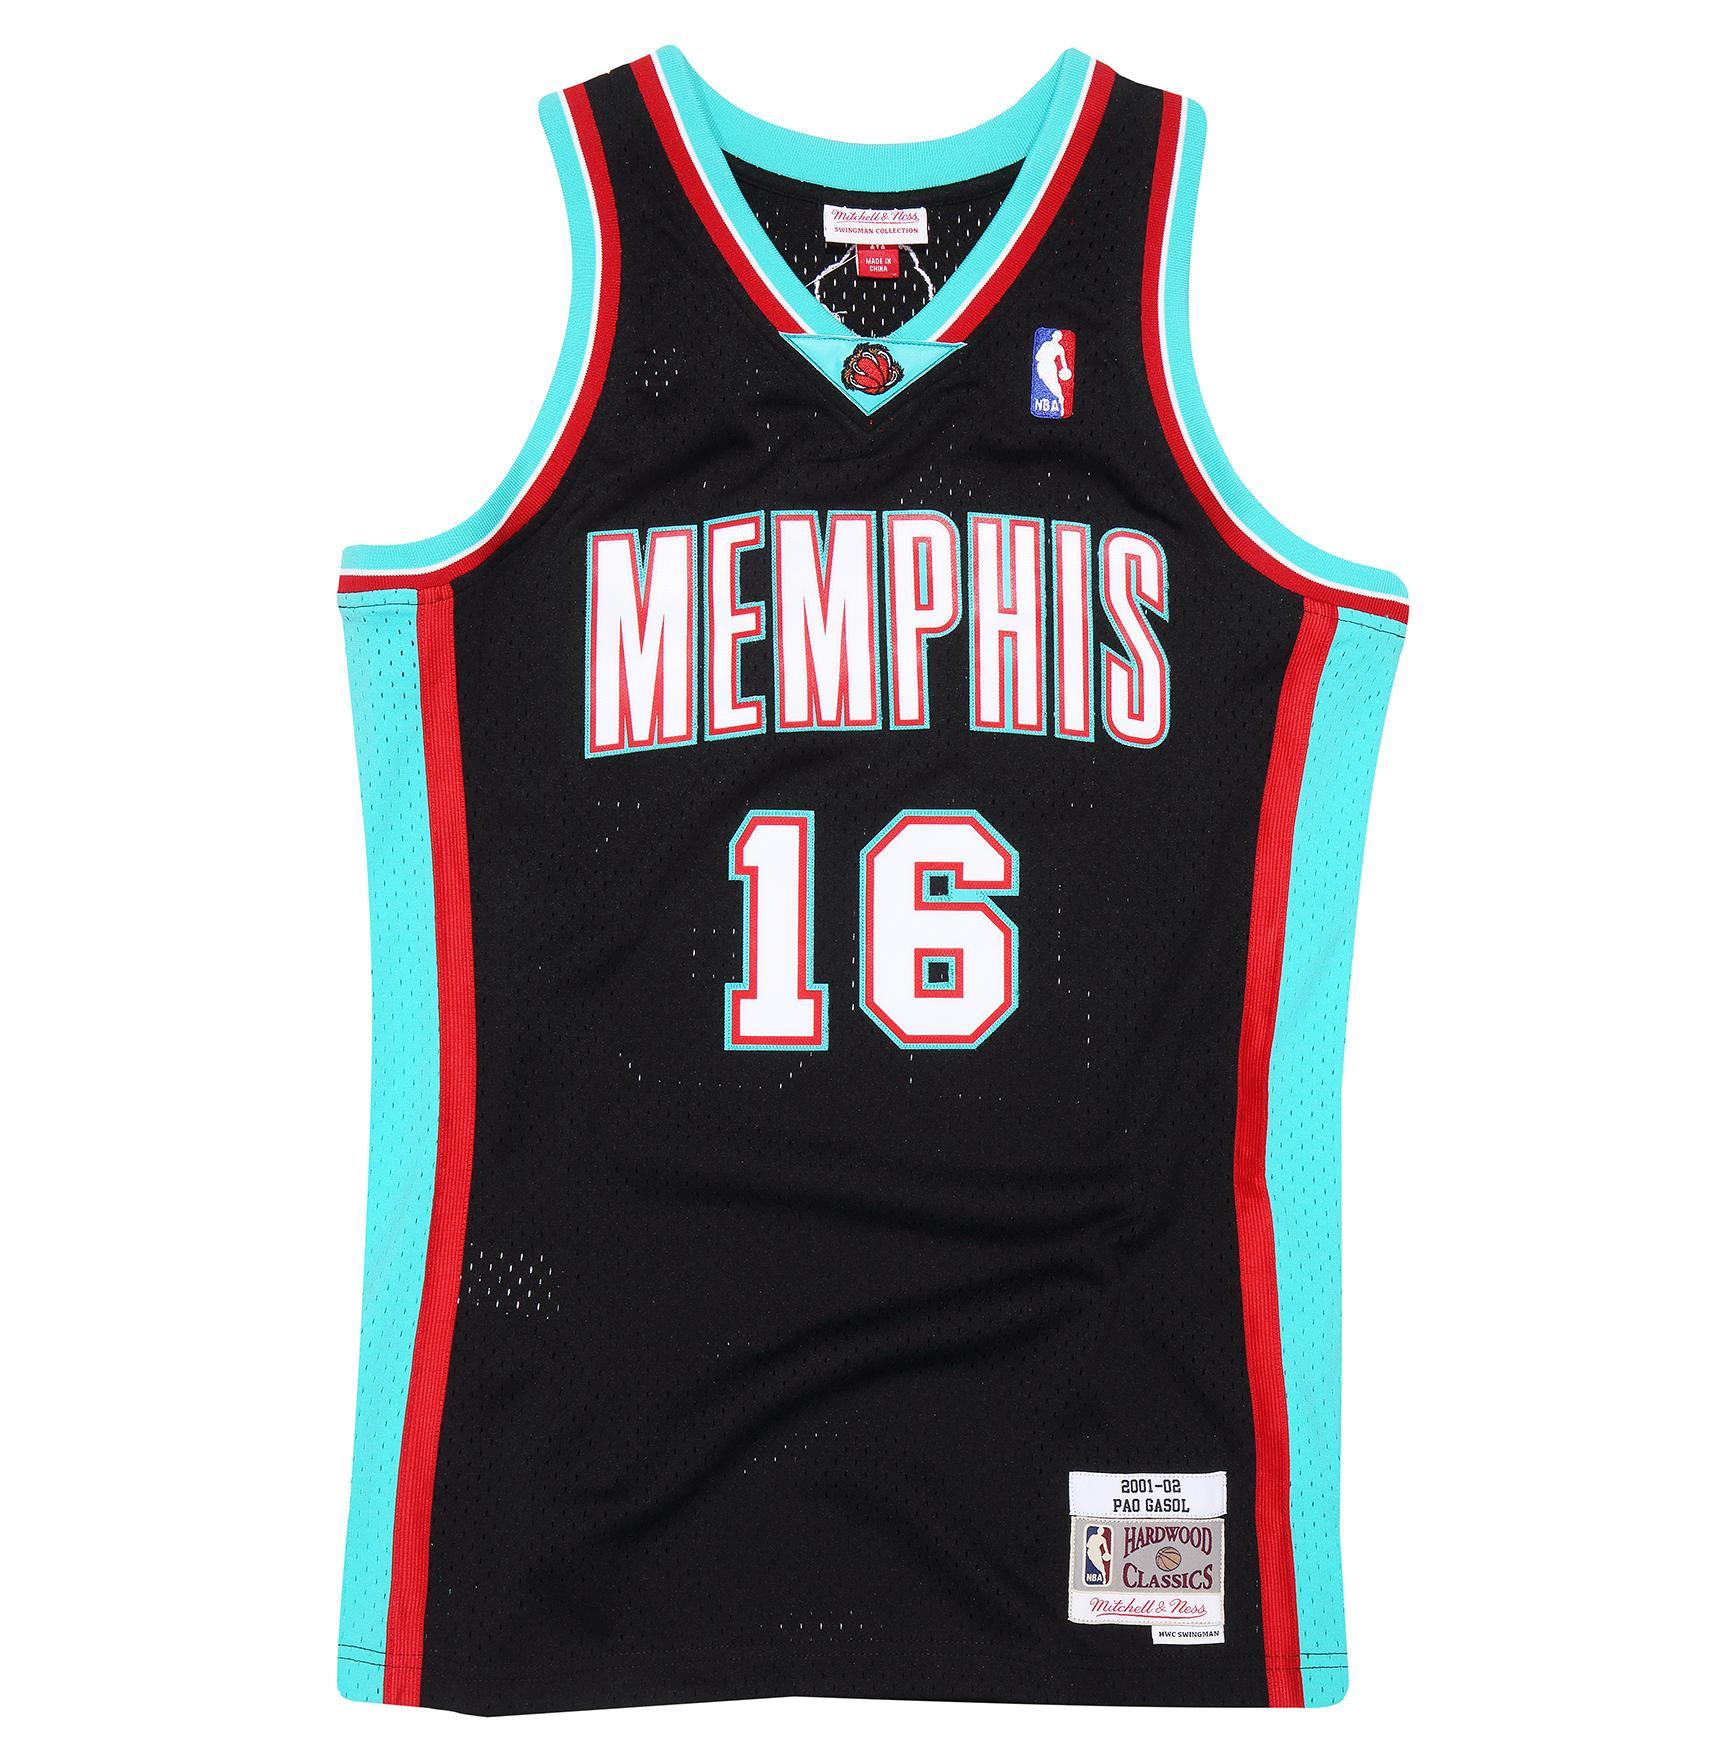 detailing dbb39 77b0f Mitchell & Ness | Pau Gasol 2001-02 Memphis Grizzlies Road ...